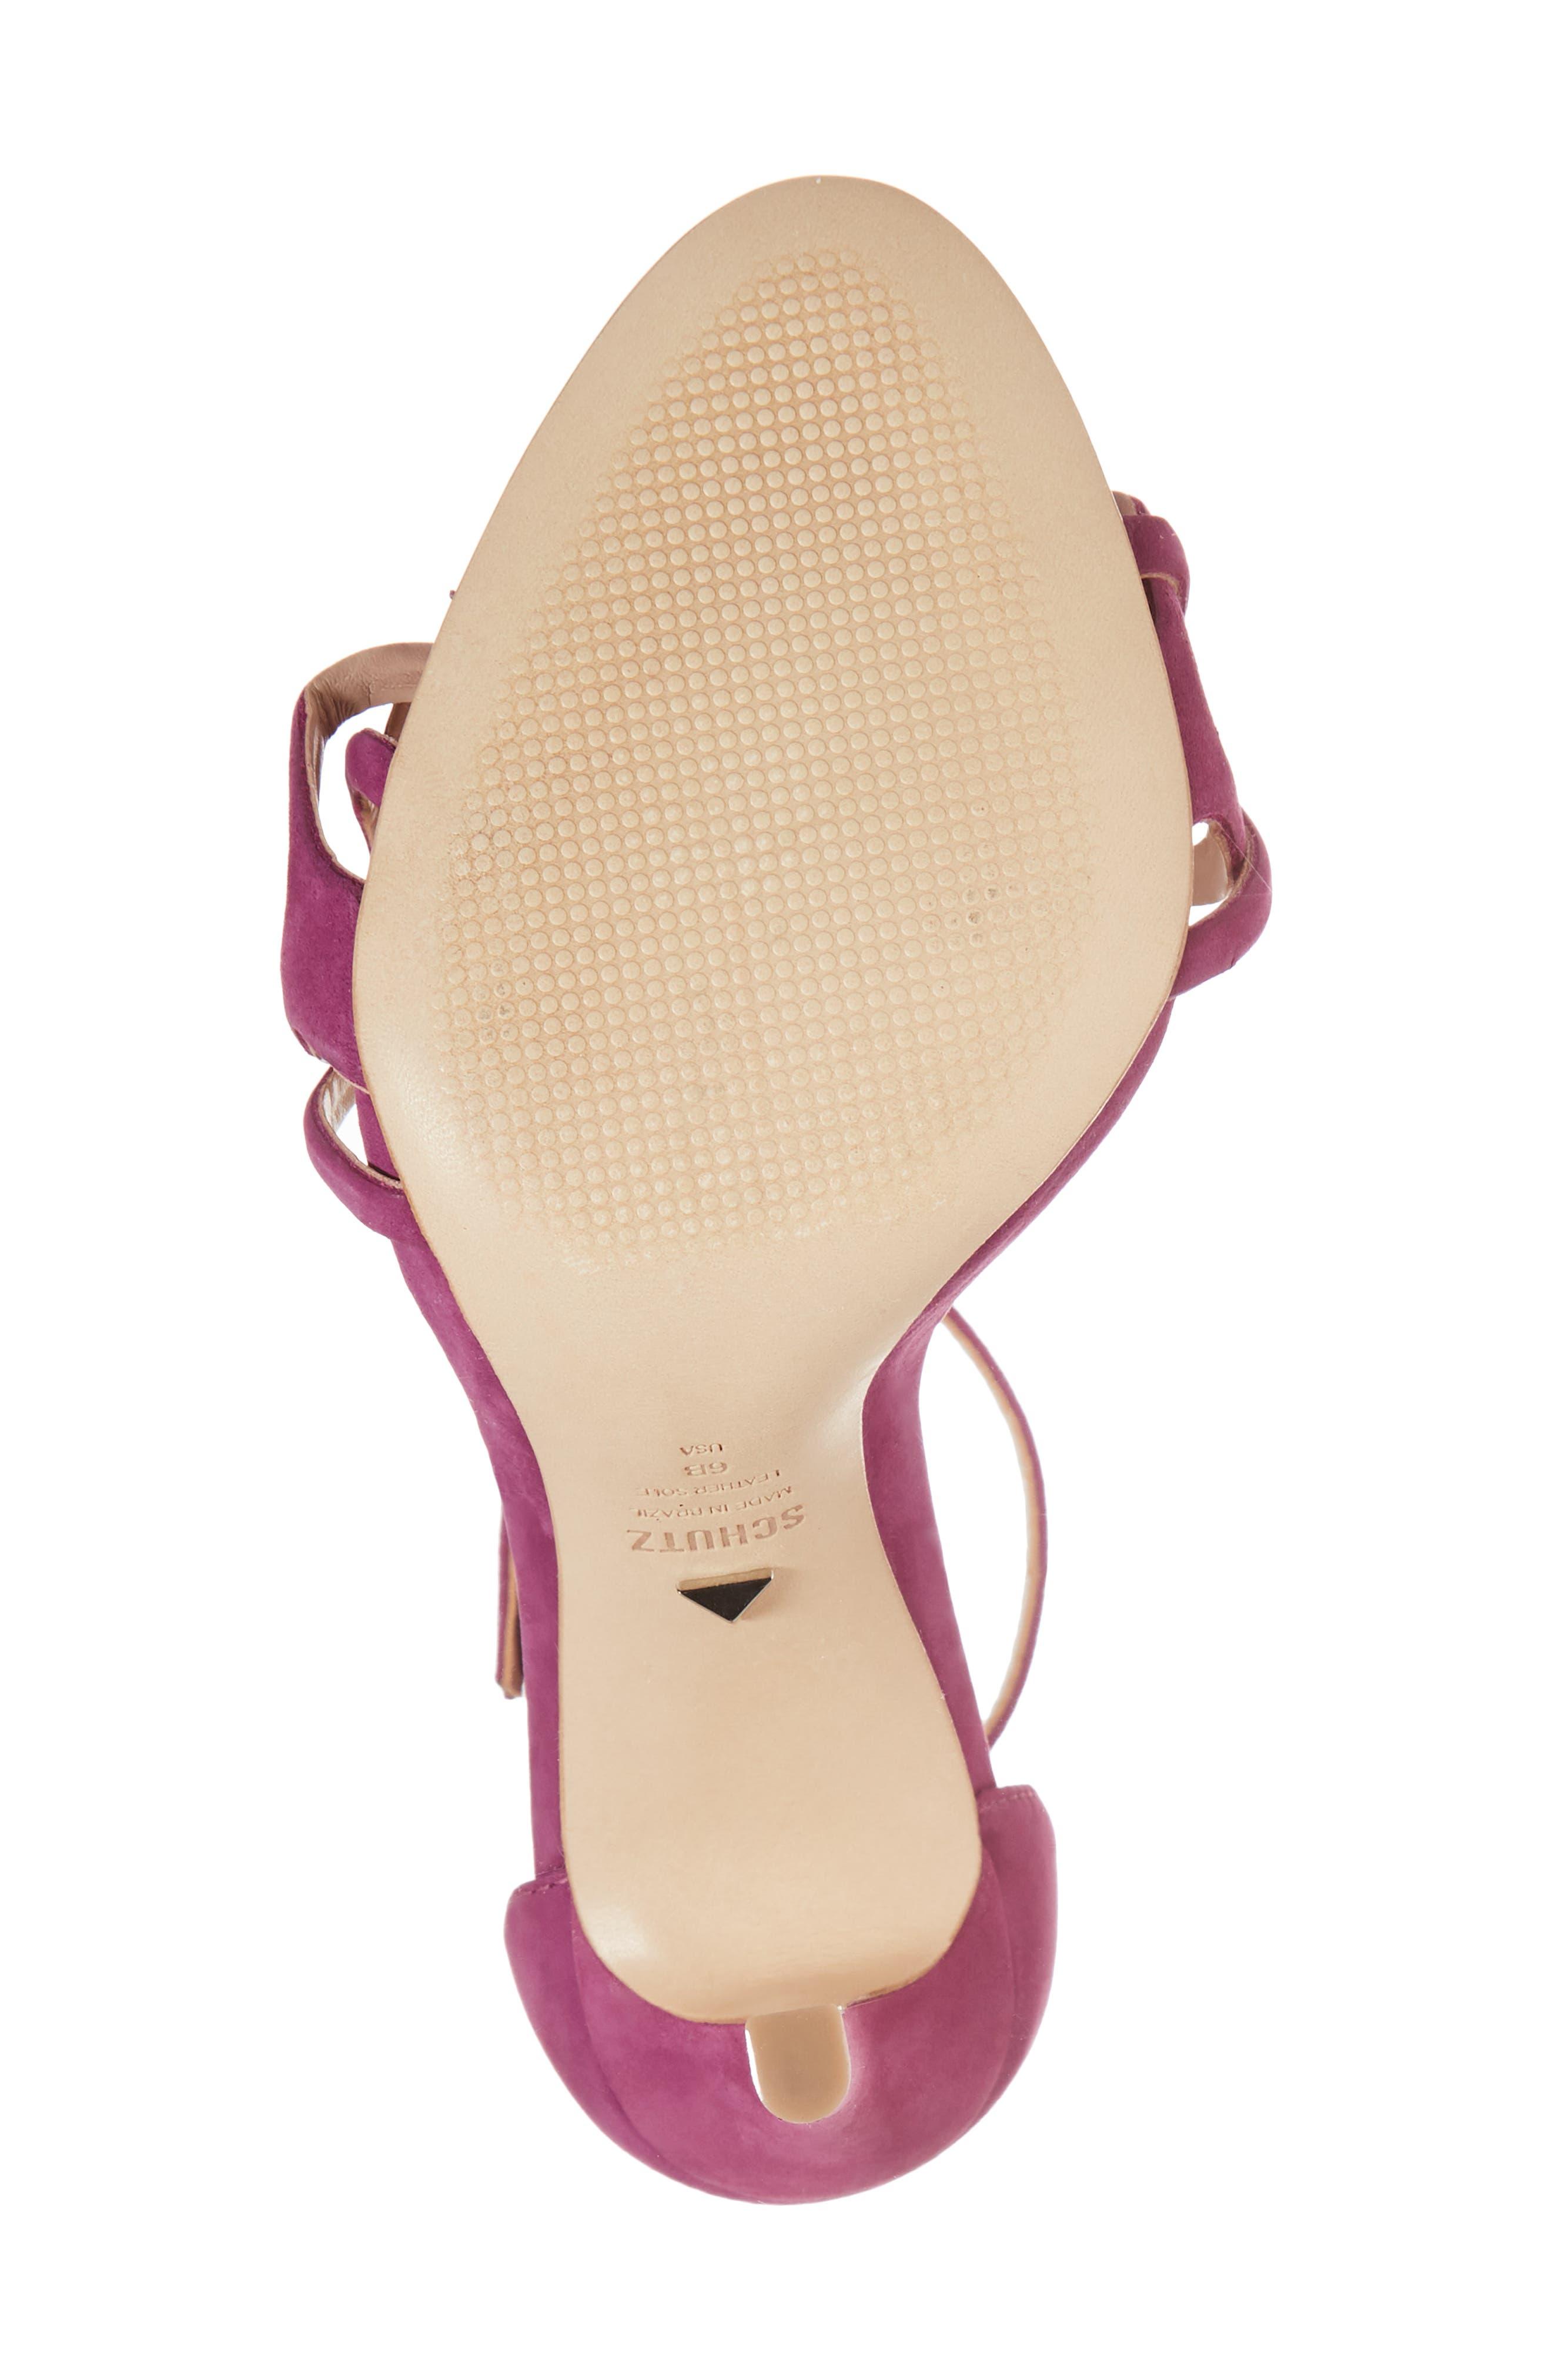 Sthefany Ankle Strap Sandal,                             Alternate thumbnail 6, color,                             Grape Leather